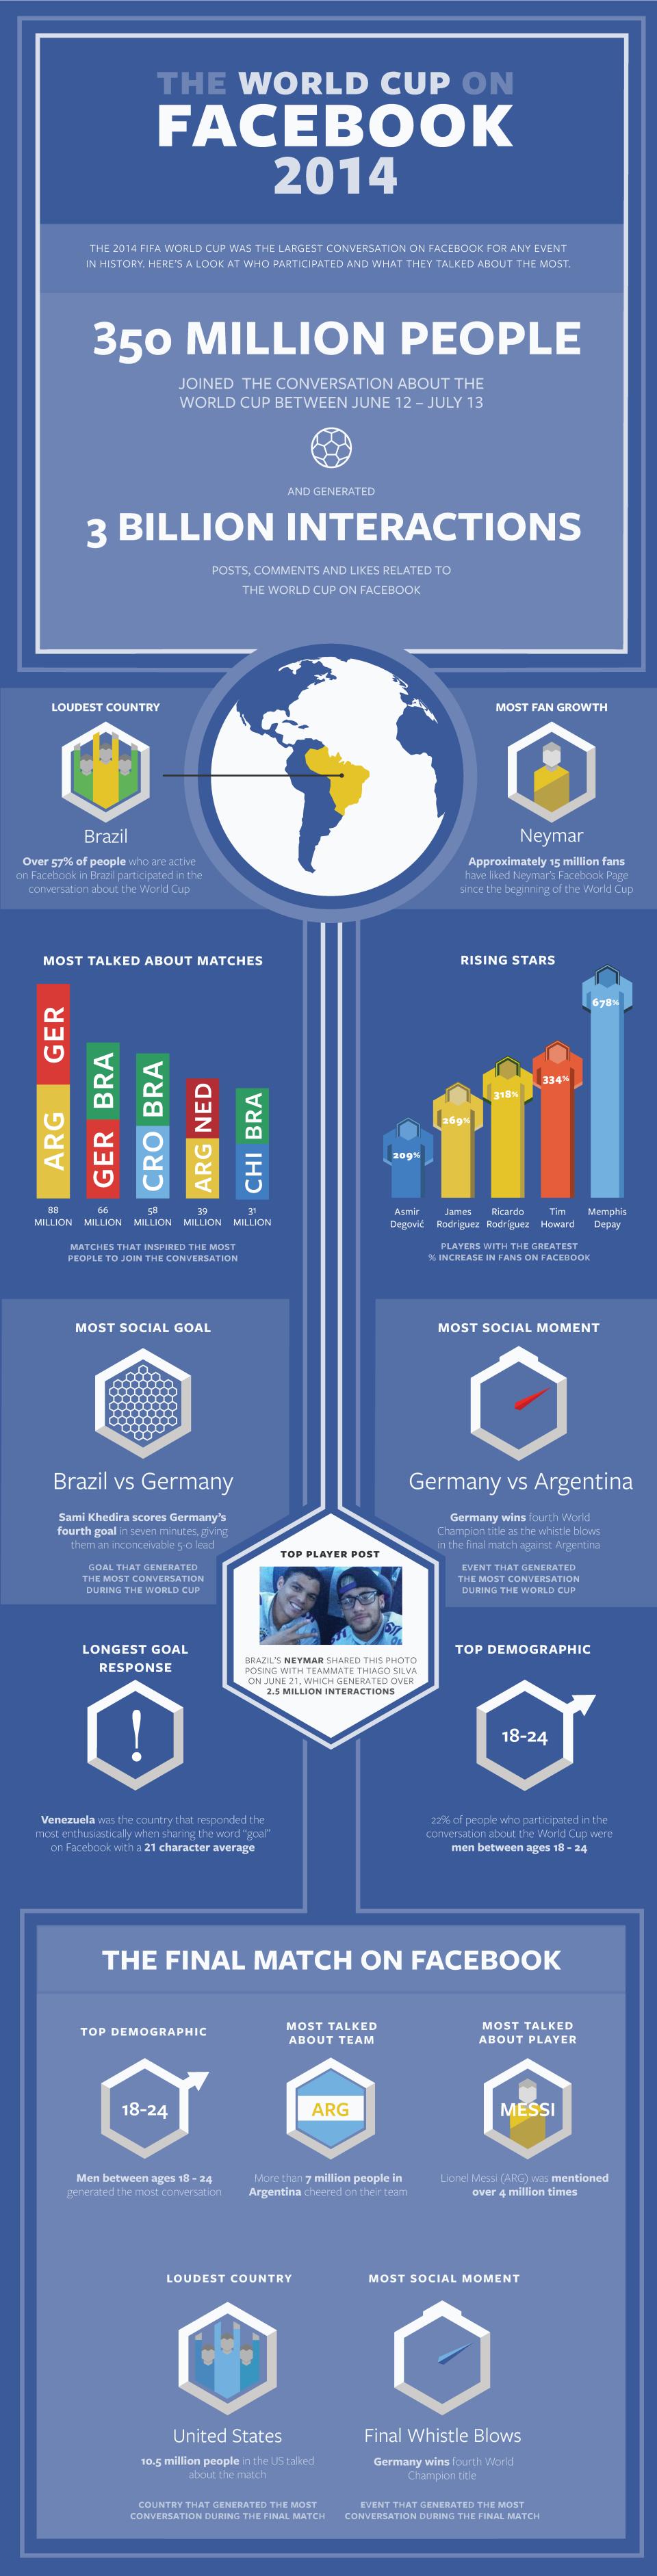 facebook_wc_infographic_big